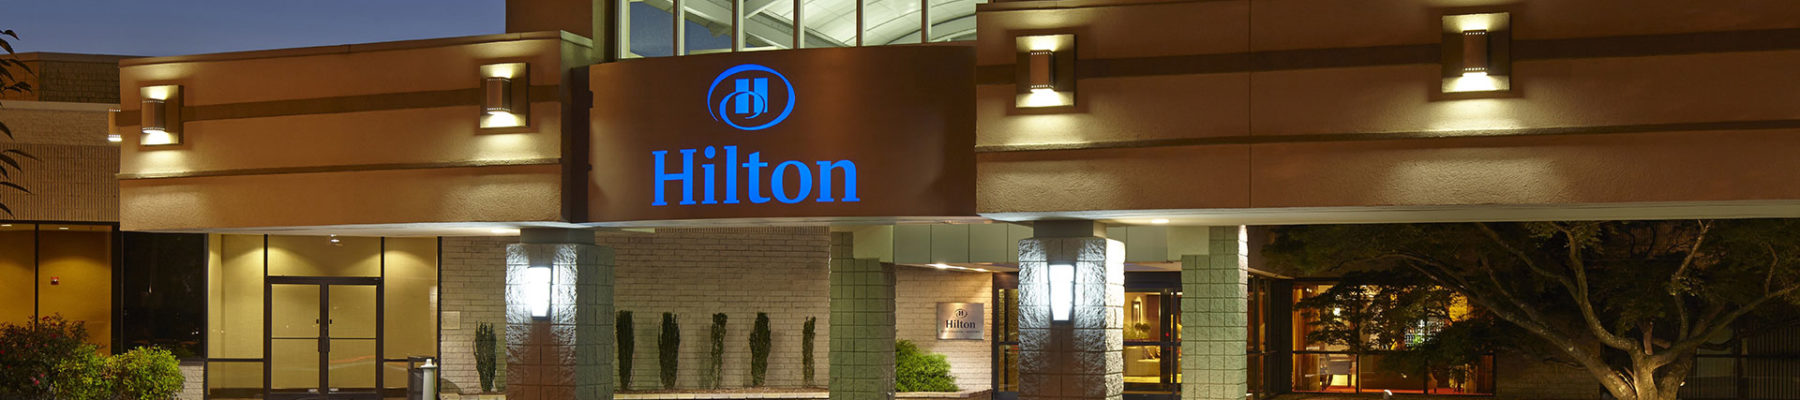 Hilton North Raleigh